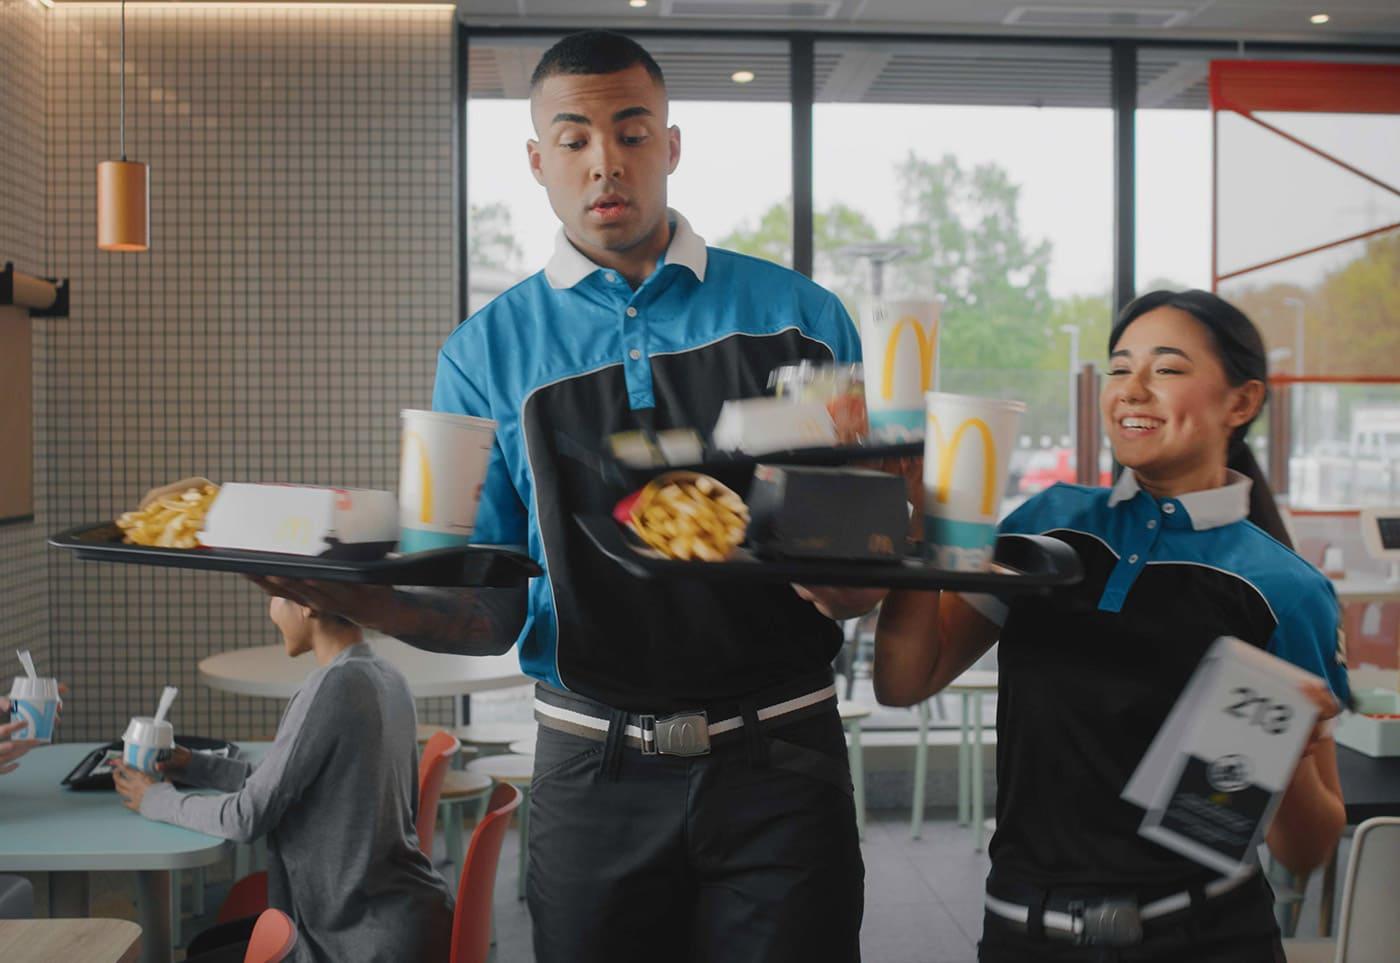 e-Sports_Commercial_McDonalds